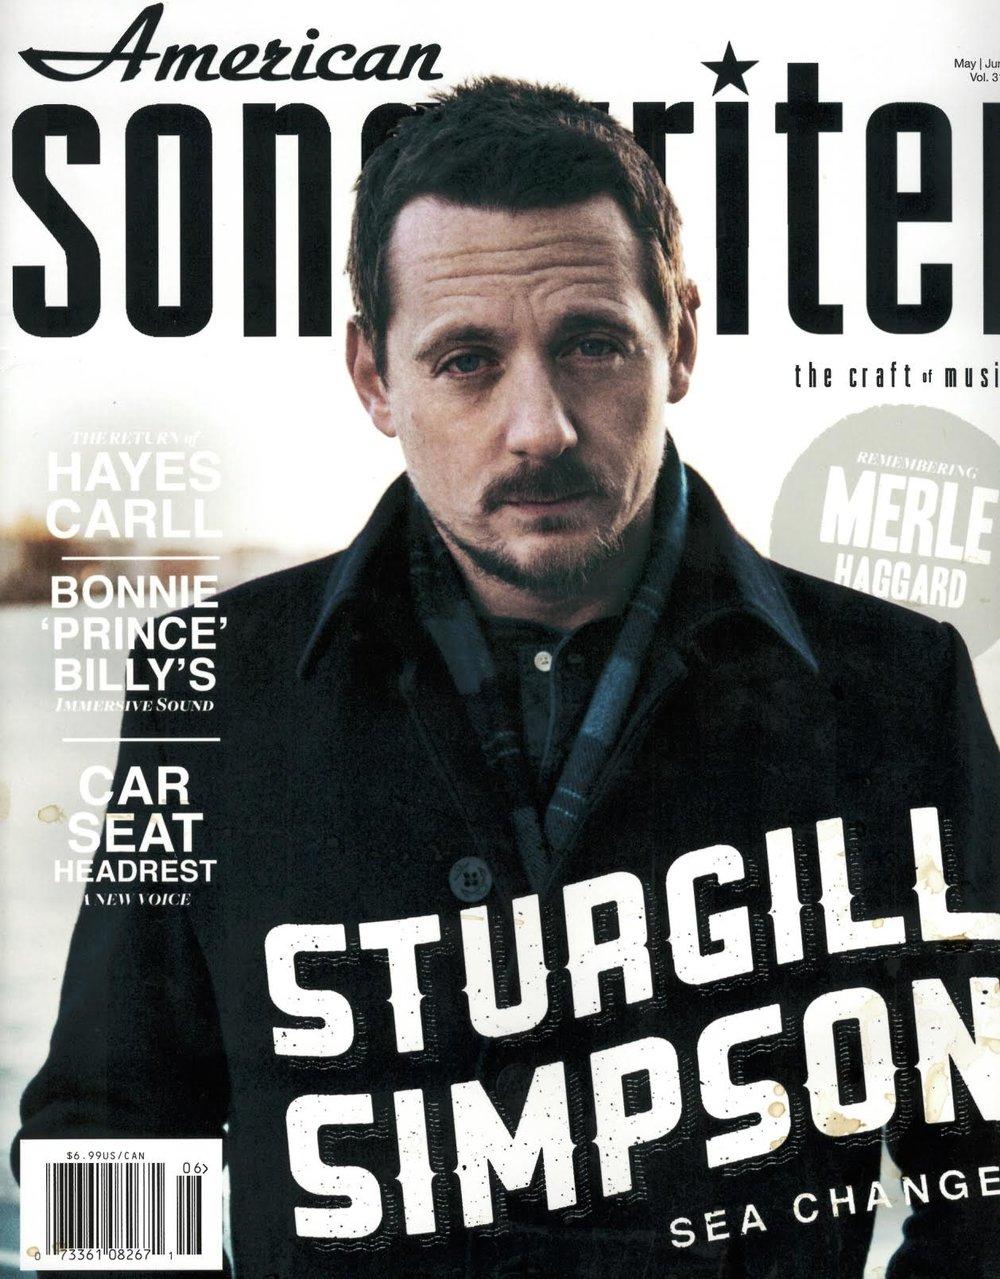 AmericanSongwriter-Sturgill-Carseatheadrestcover.jpg